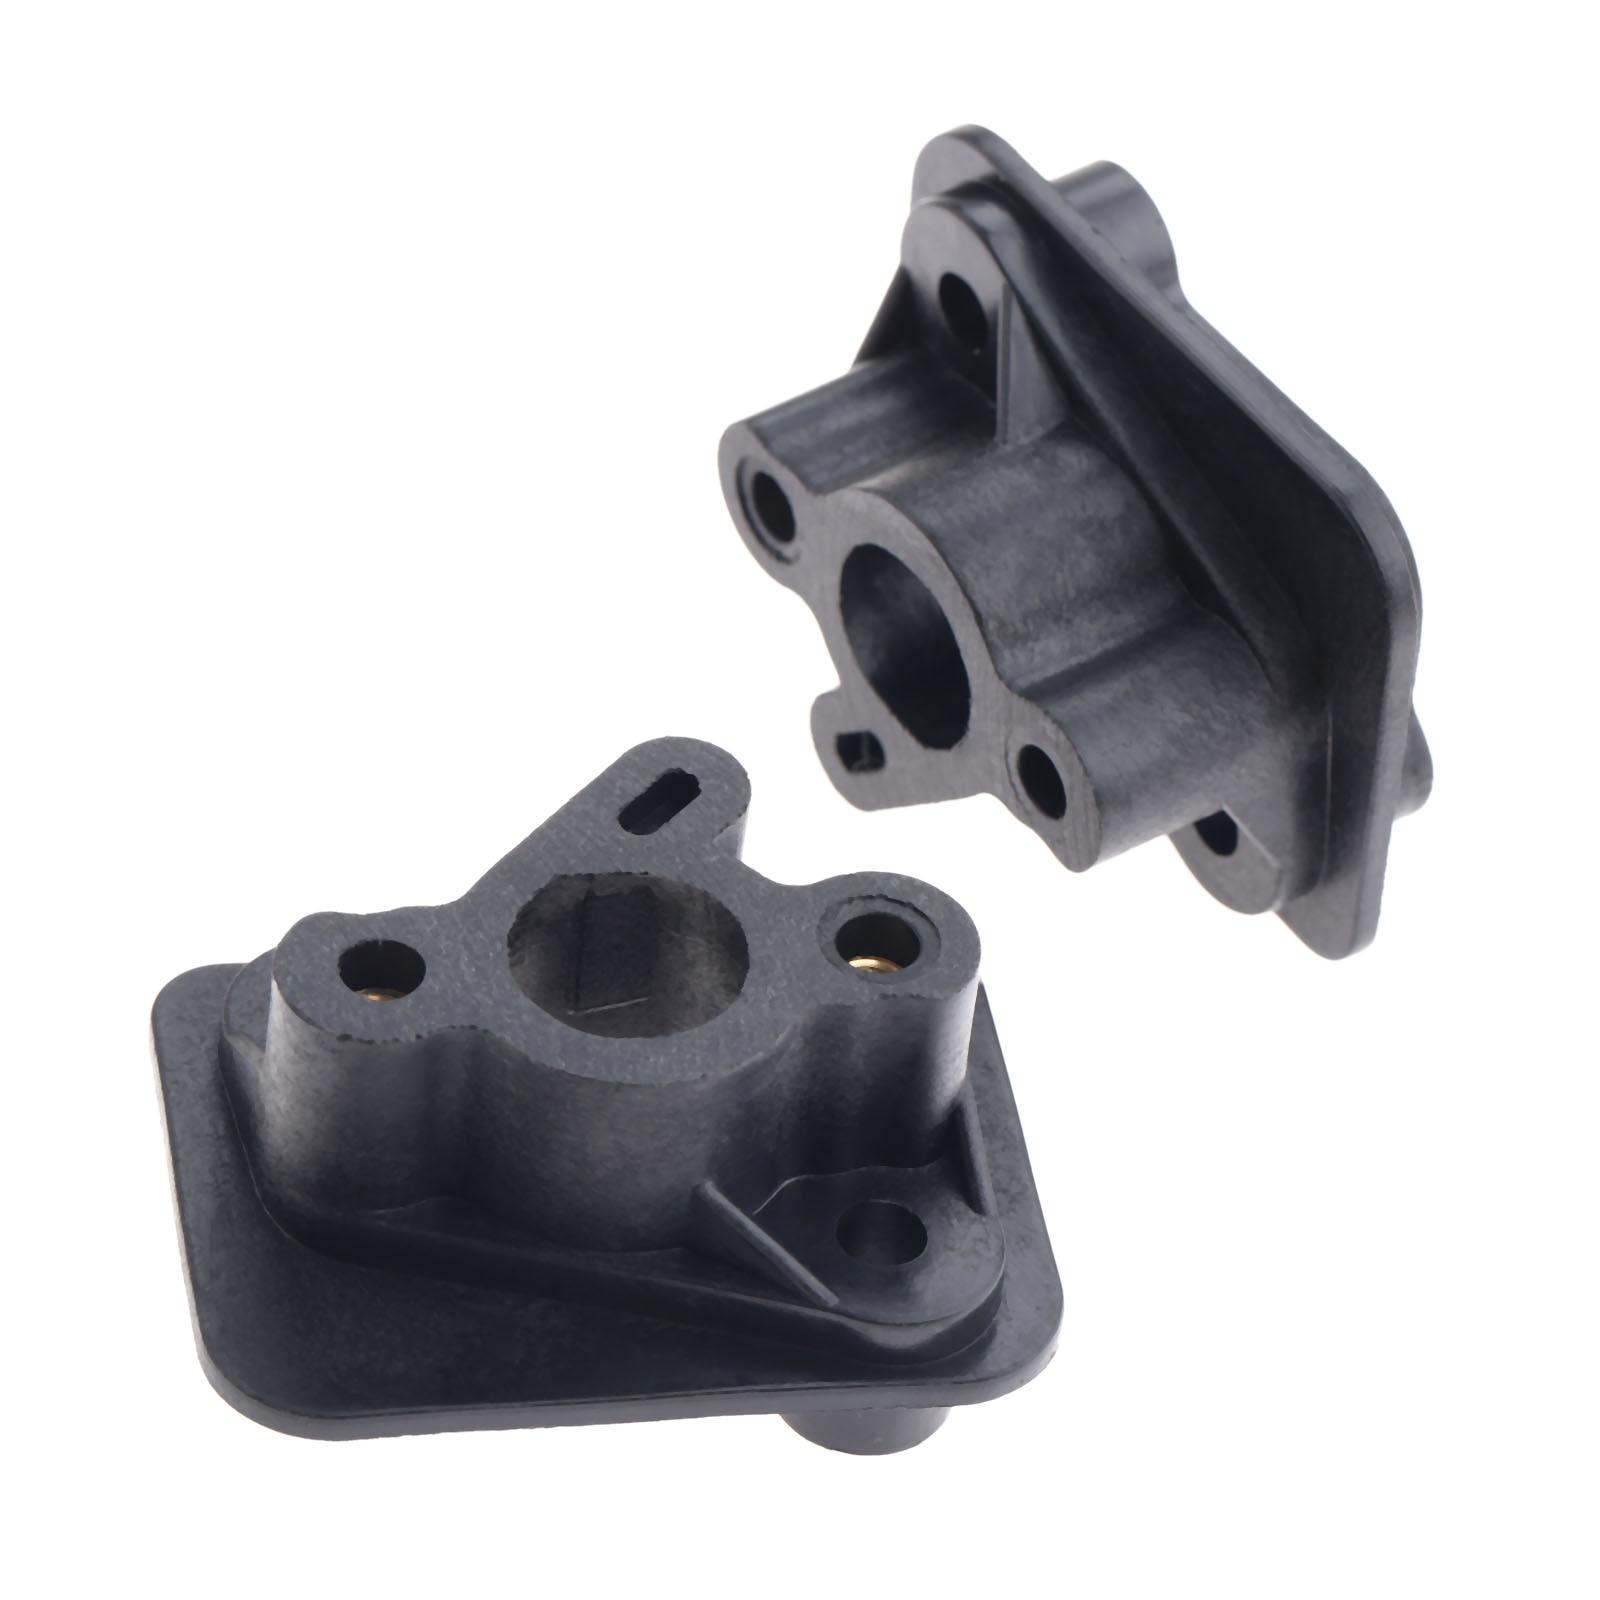 Black Inlet Carburettor Intake Manifold 43cc 49cc Brushcutter MultiTool Strimmer